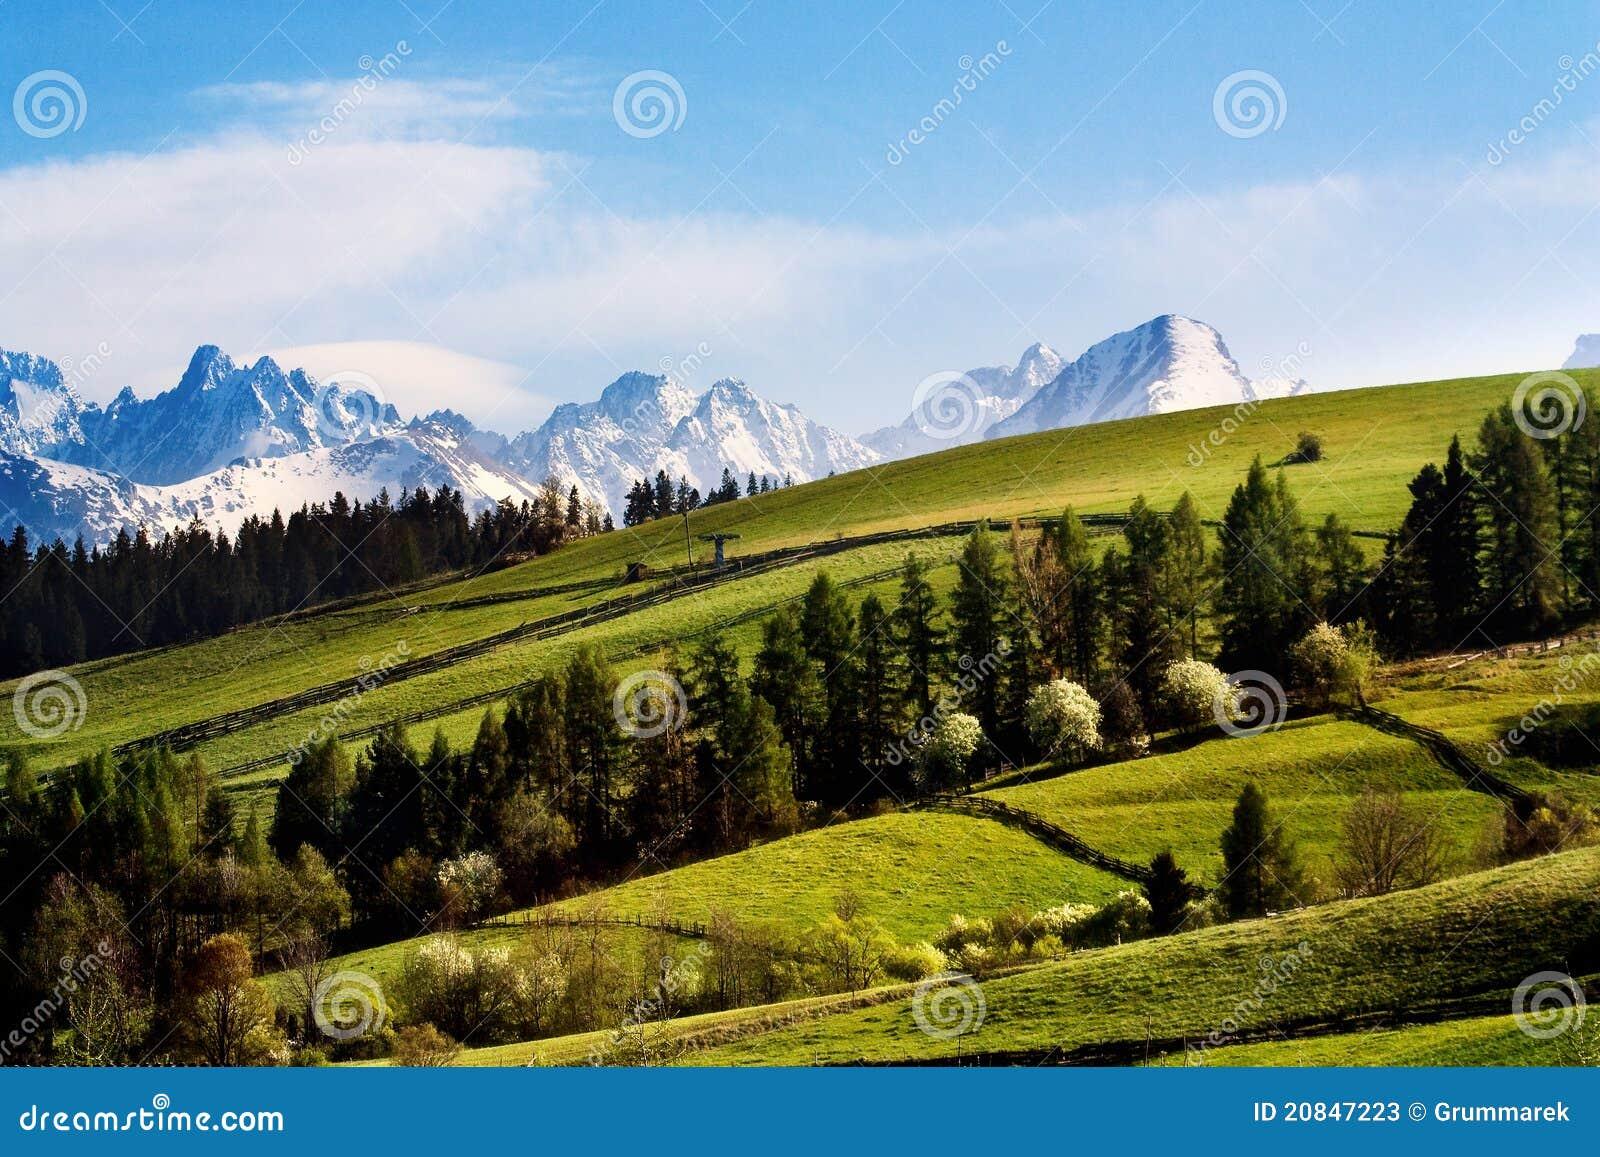 Tatry mountains